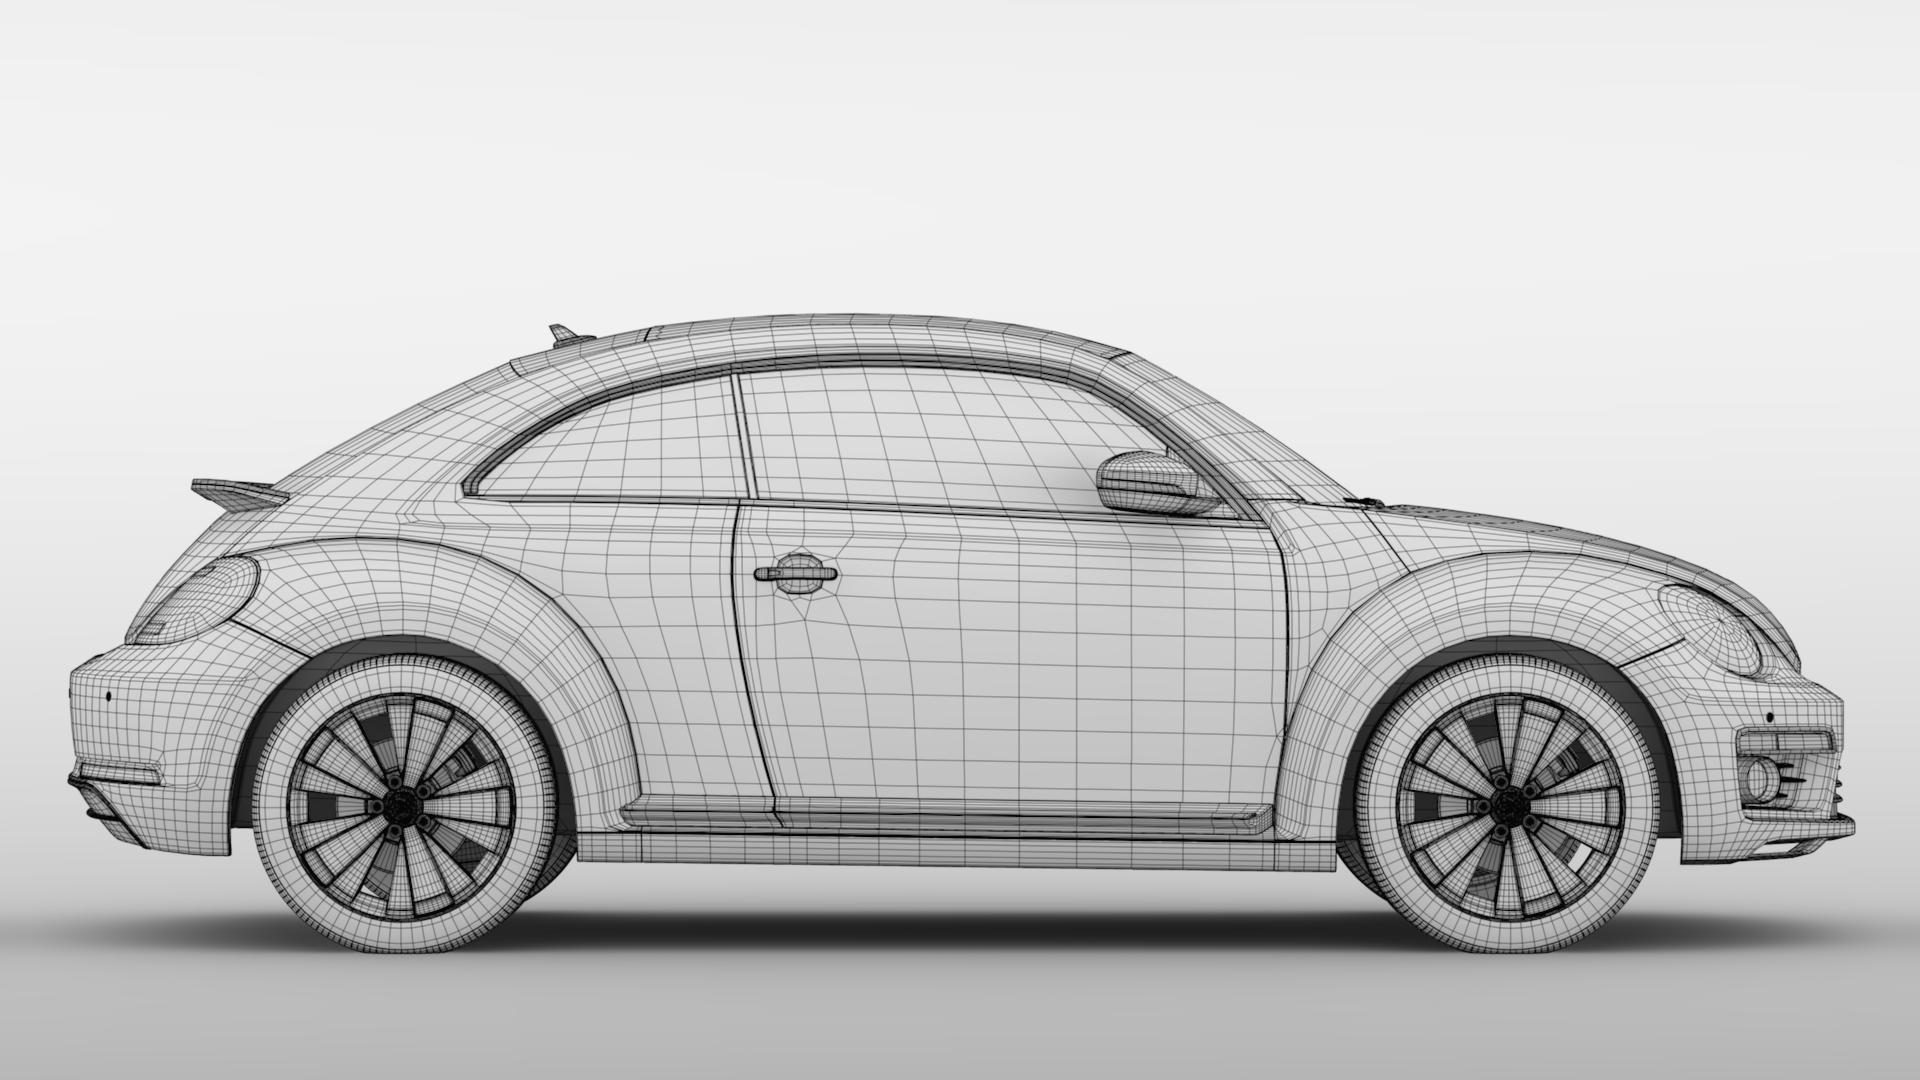 vw beetle 2017 3d model 3ds max fbx c4d lwo ma mb hrc xsi obj 221582